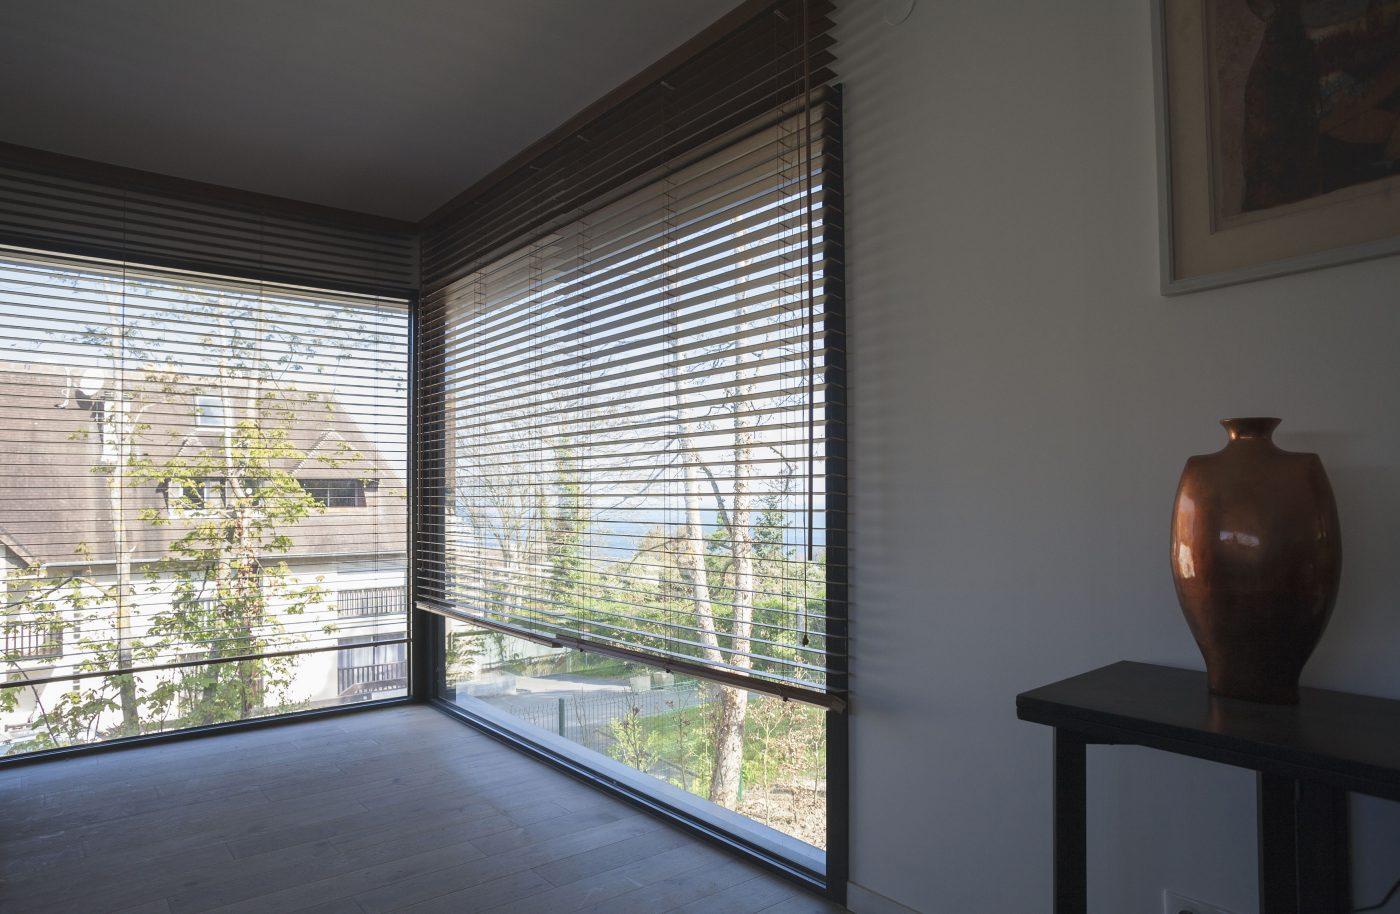 Philippe_Zerbib_Architecte_construction_maisons_ossature_bois_projet_maison_benhamou_MG_8456